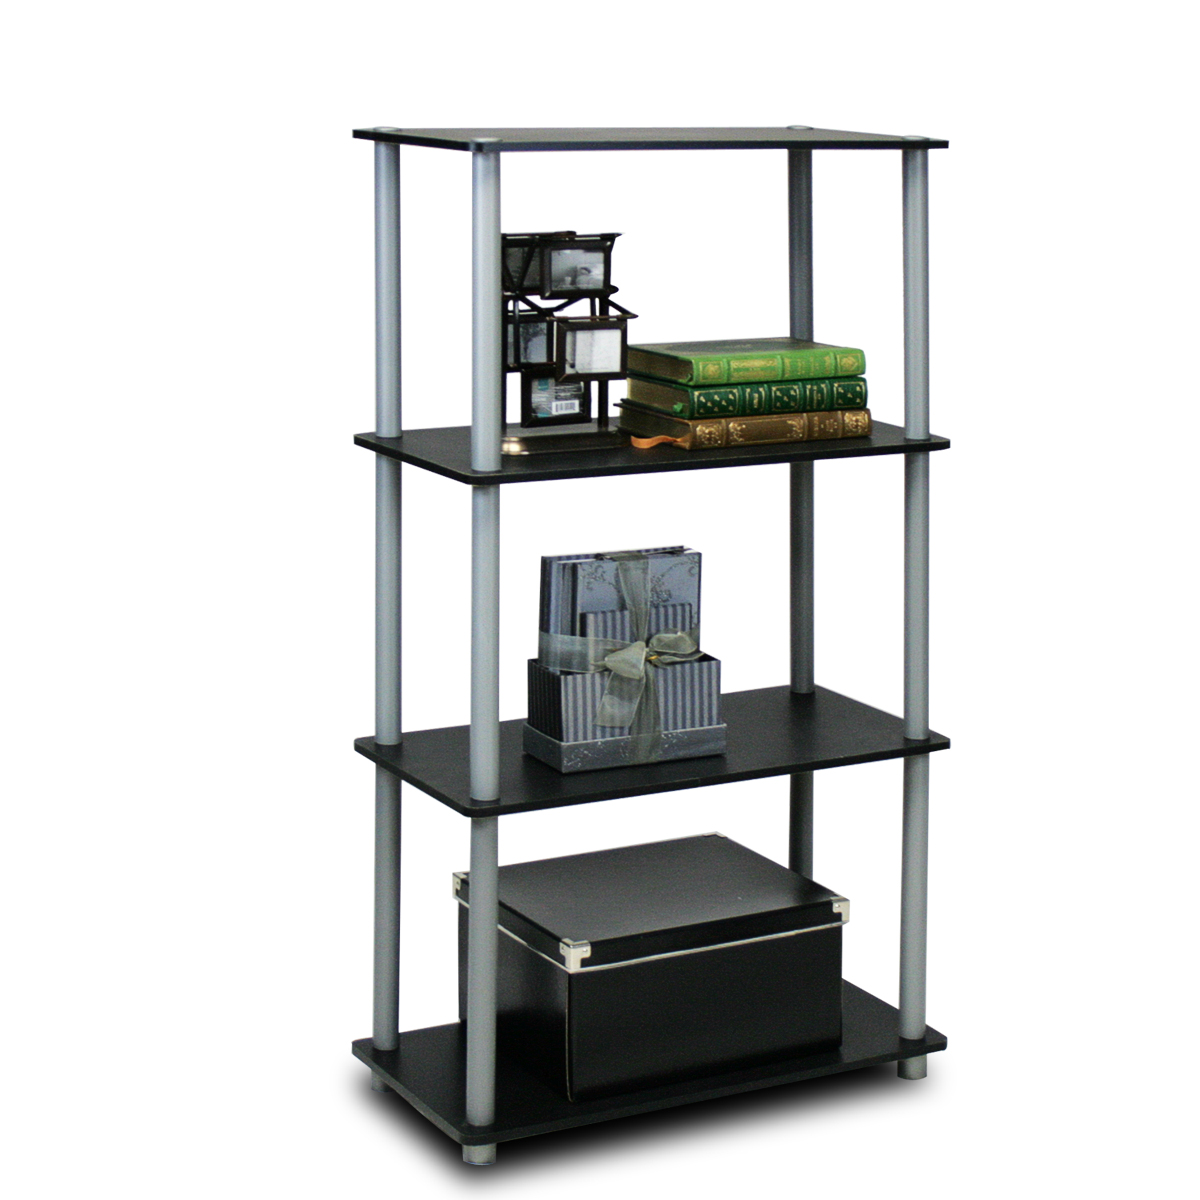 Furinno Turn-N-Tube 3-Tier Compact Multipurpose Shelf Display Rack, 10024WN/BR